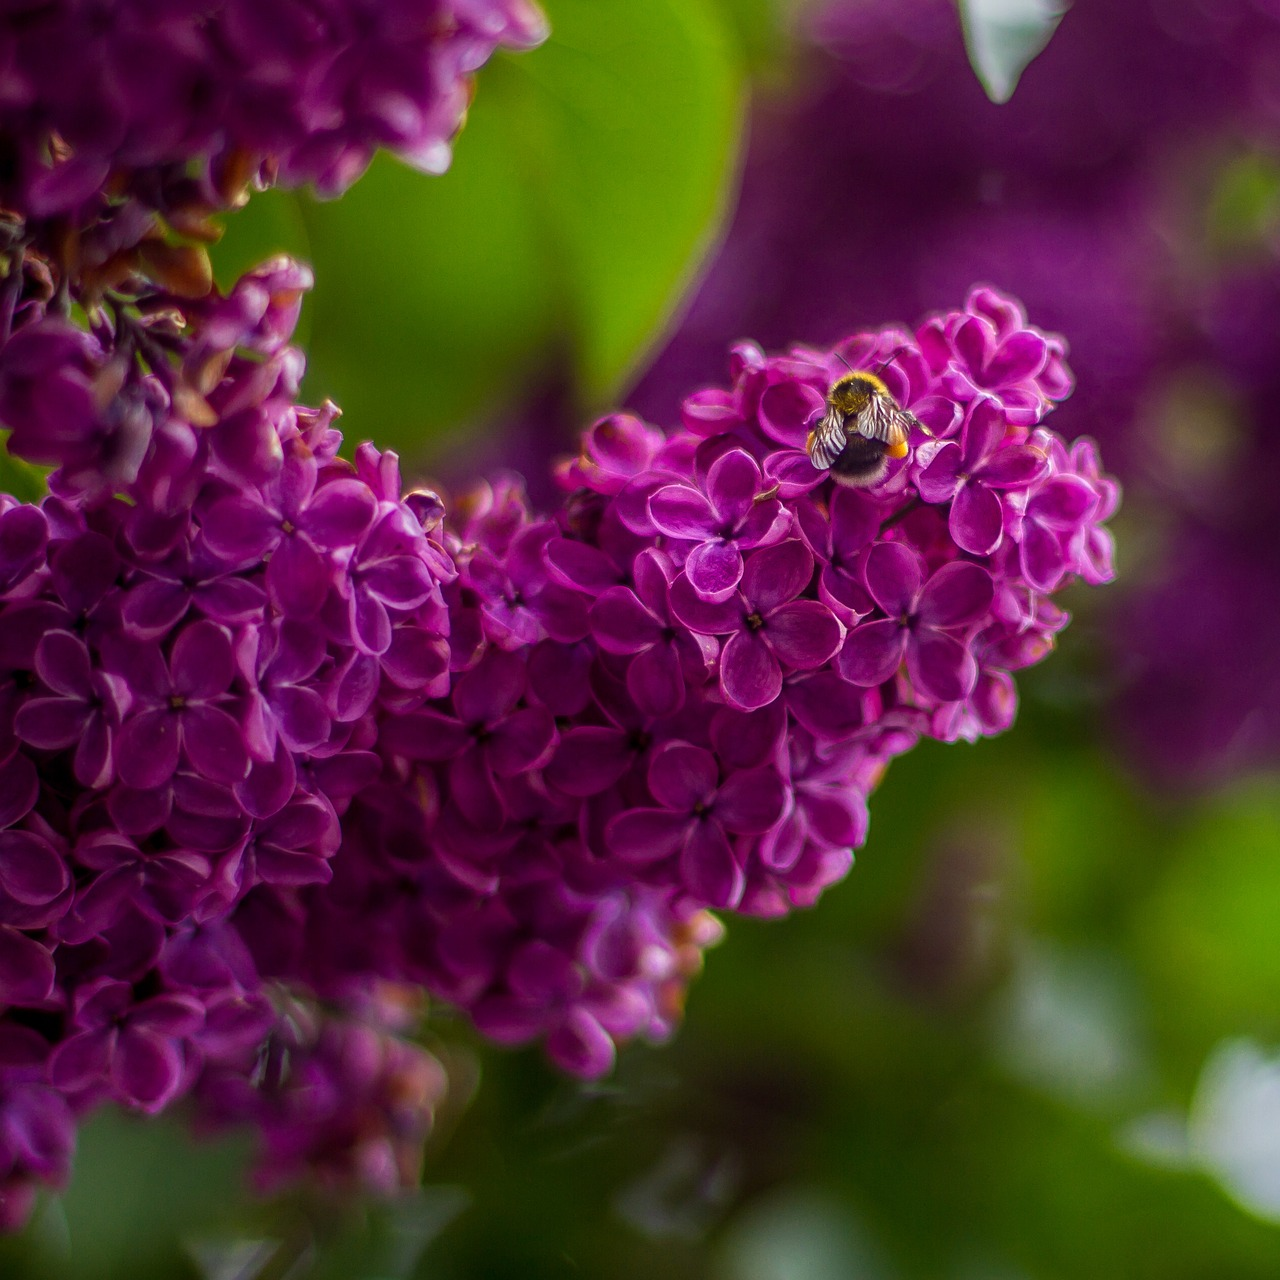 Первоцветы якутии фото безукоризнен, любовью